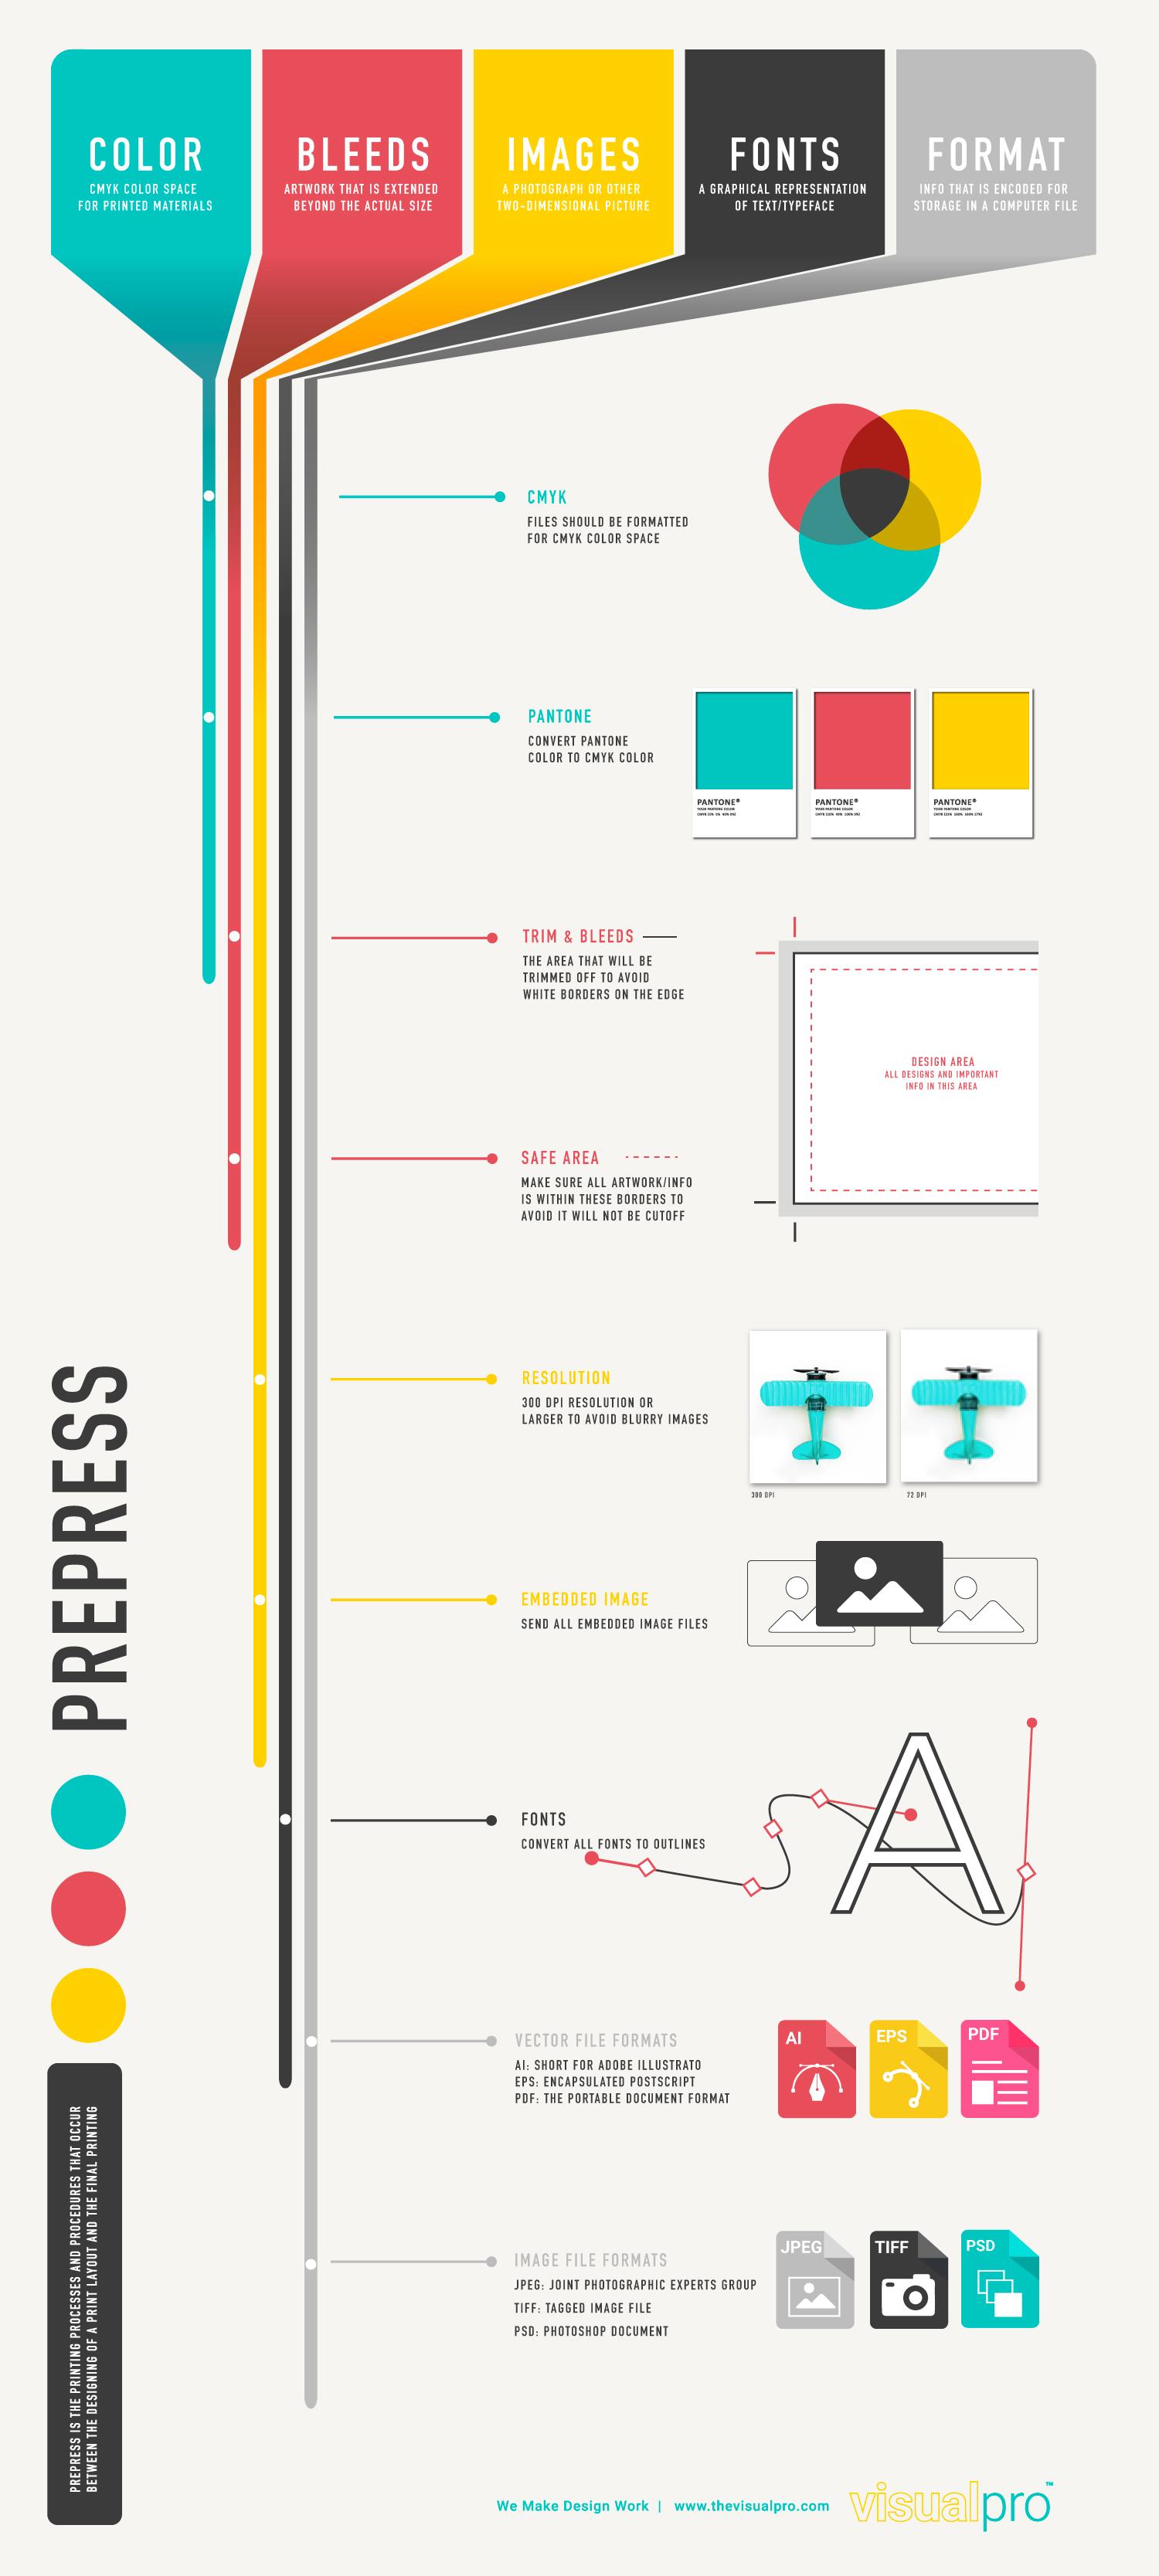 Prepress-Basic-Checklist_Infographic_VisualPro (1)